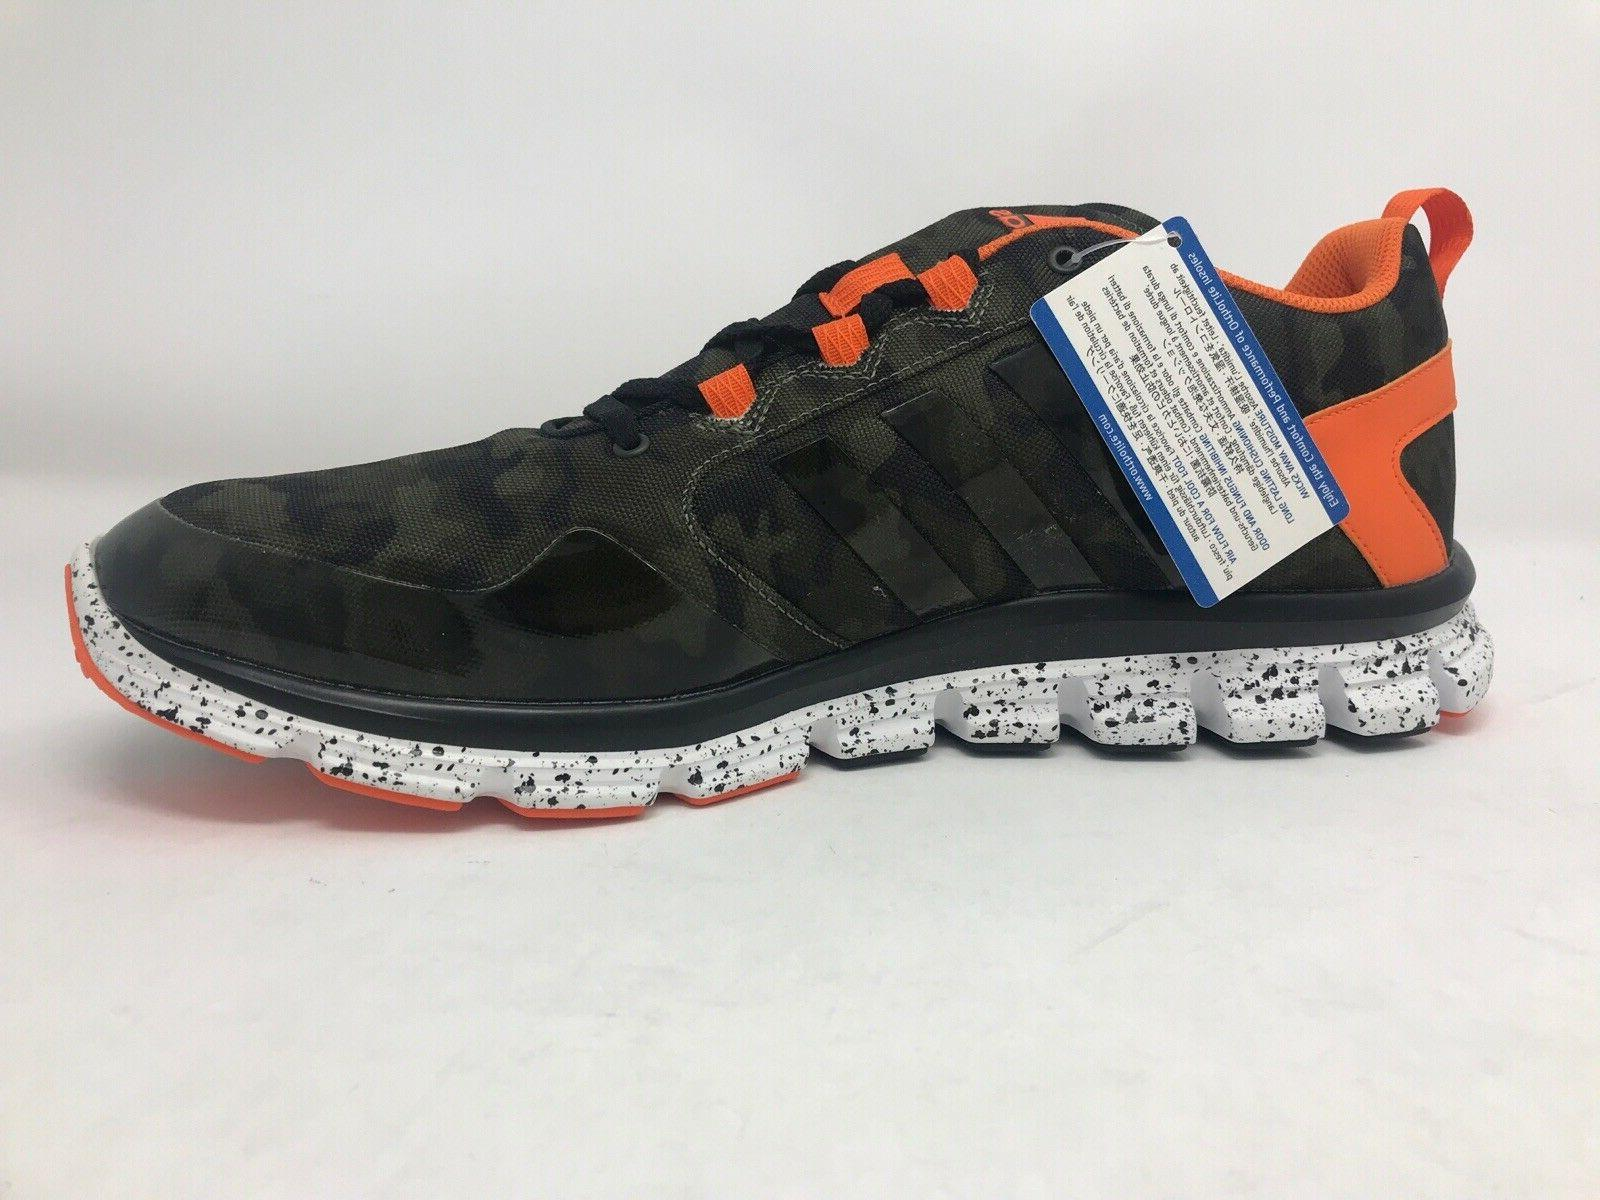 Men's Sneakers Ortholite Speed Trainer 2 Pack 14